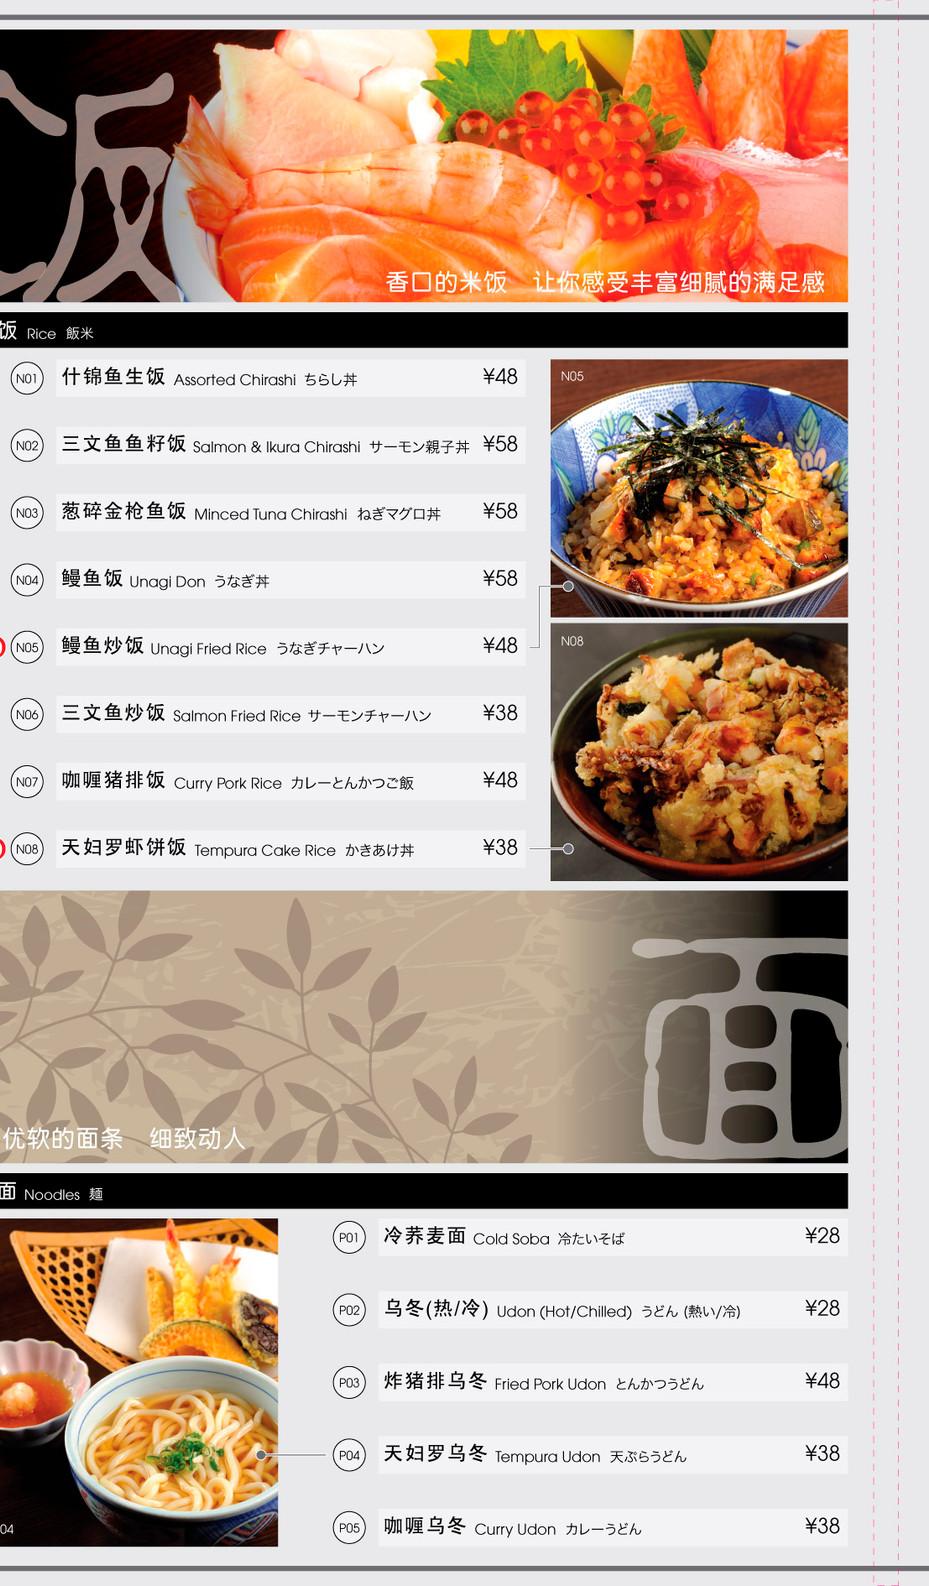 SO_Menu_P14_Rice & Noodles 2.jpg